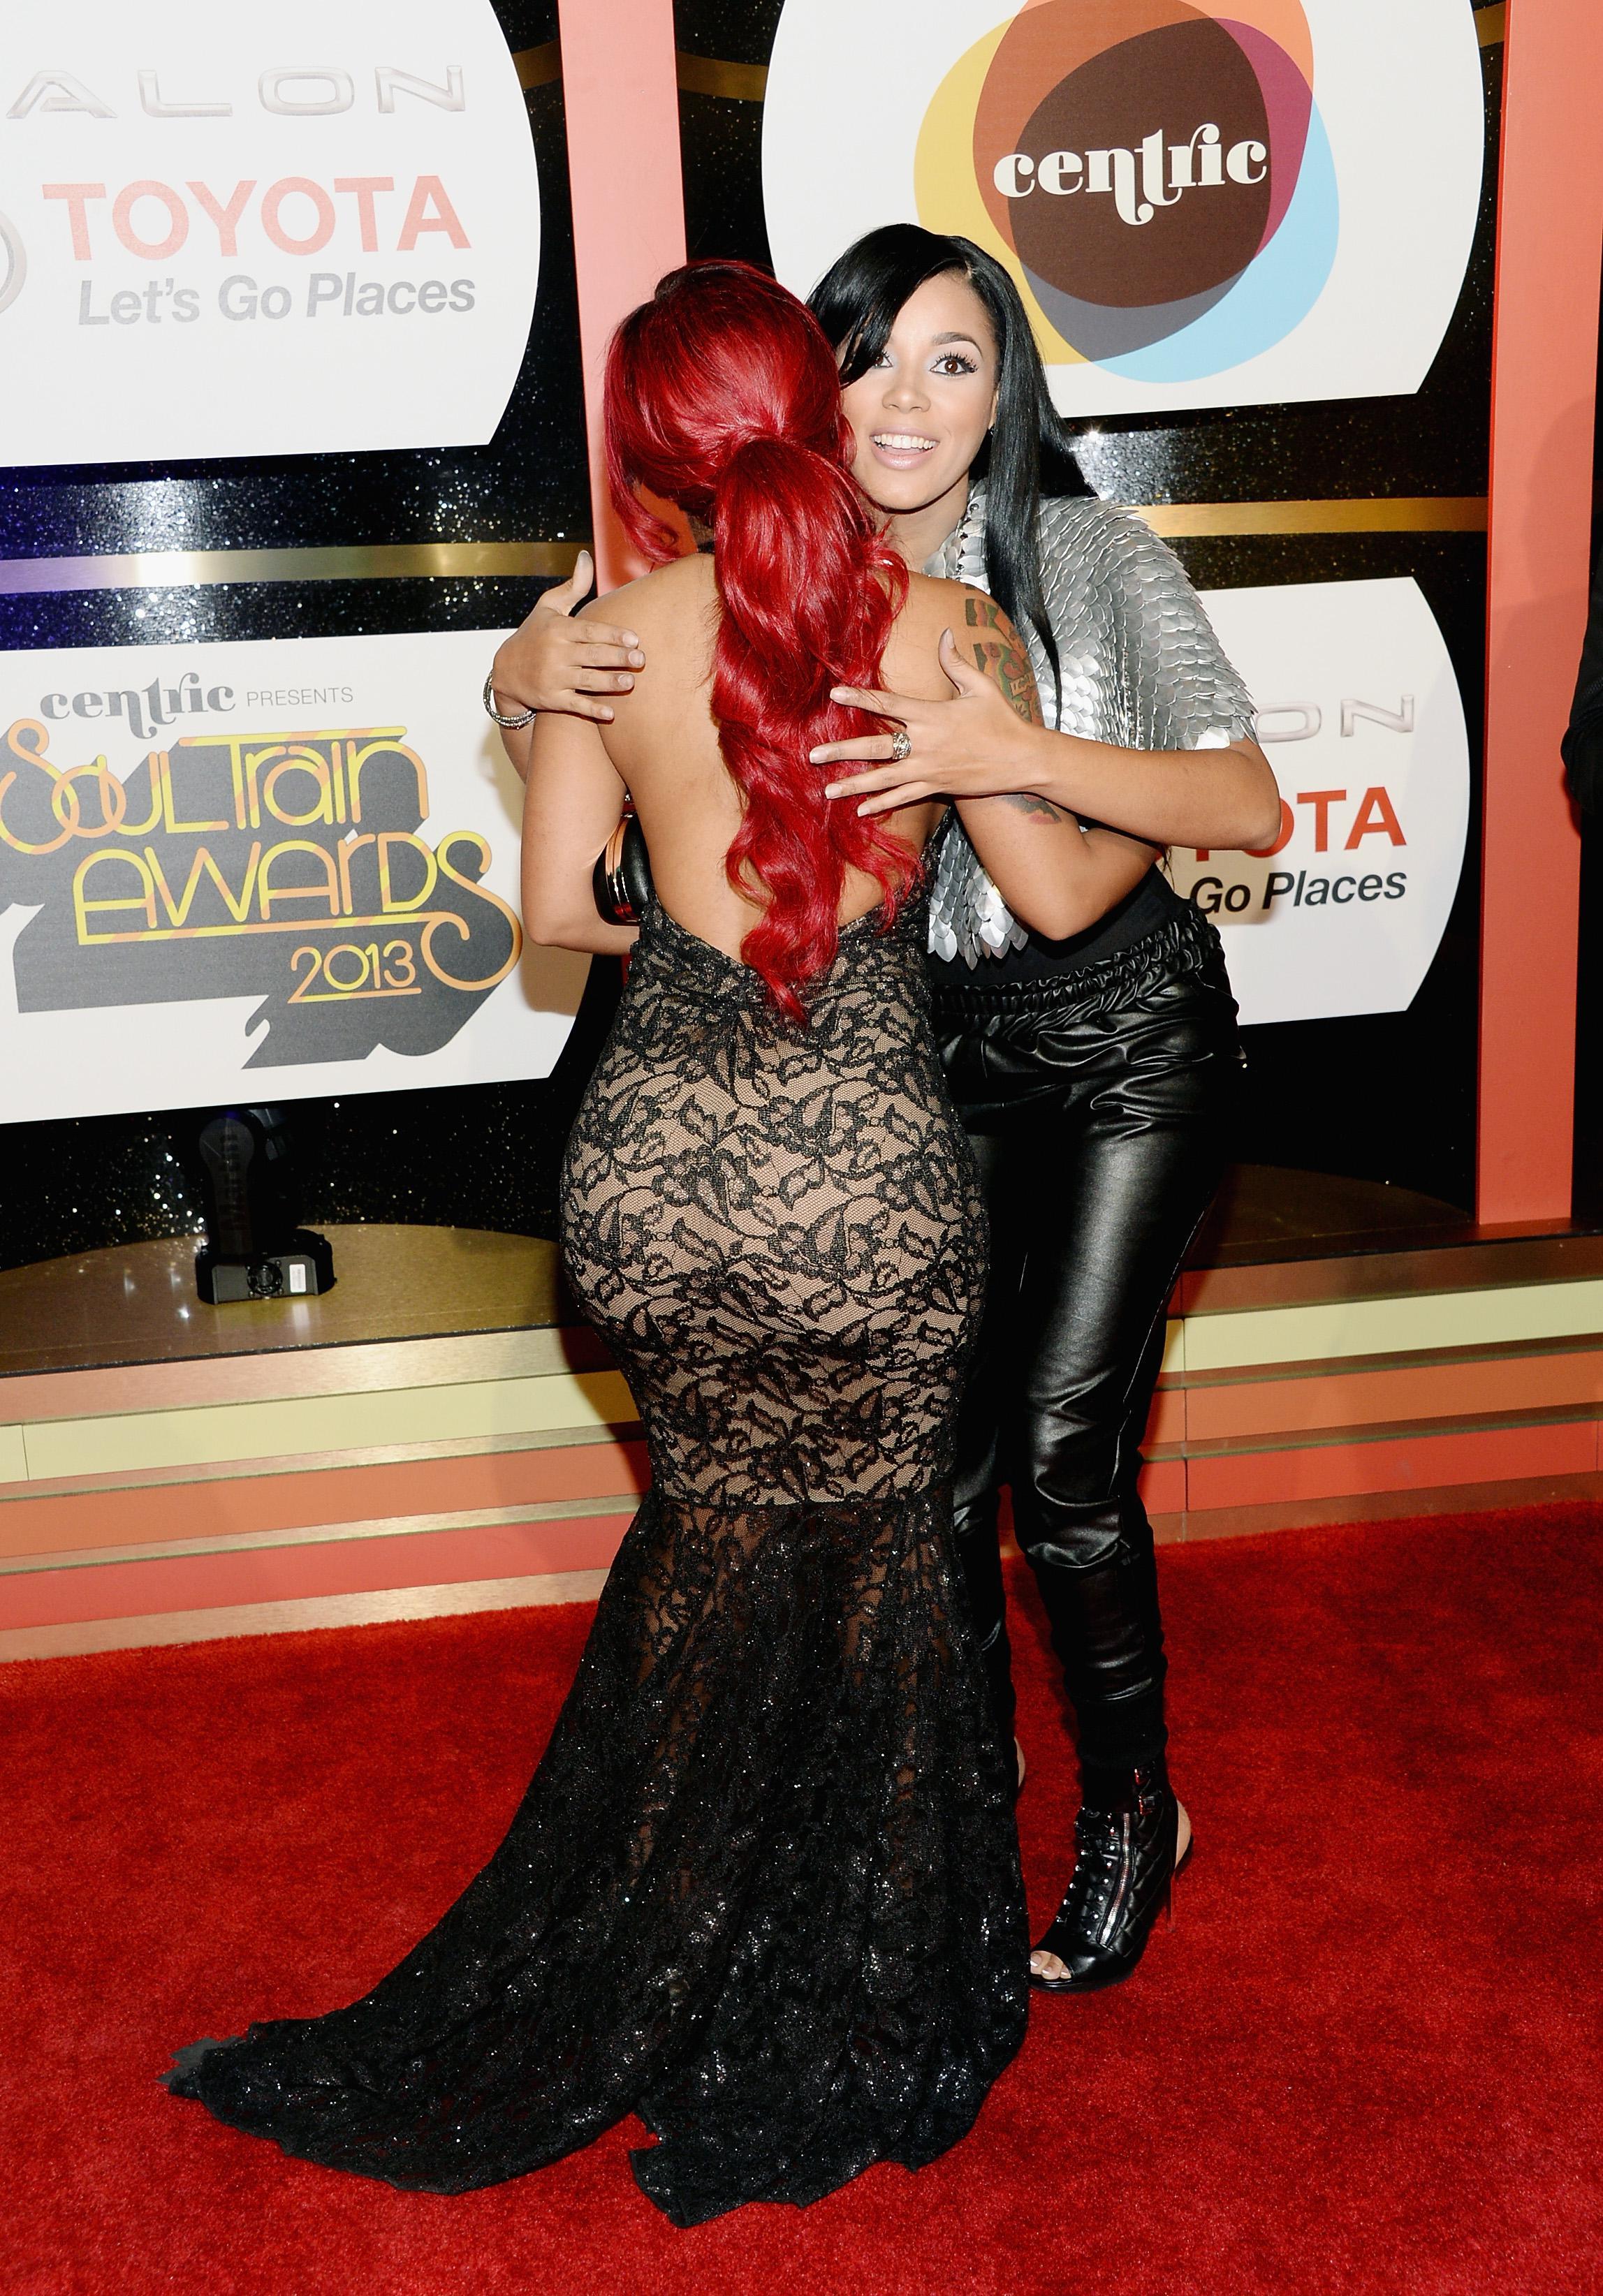 Soul Train Awards 2013 - Arrivals